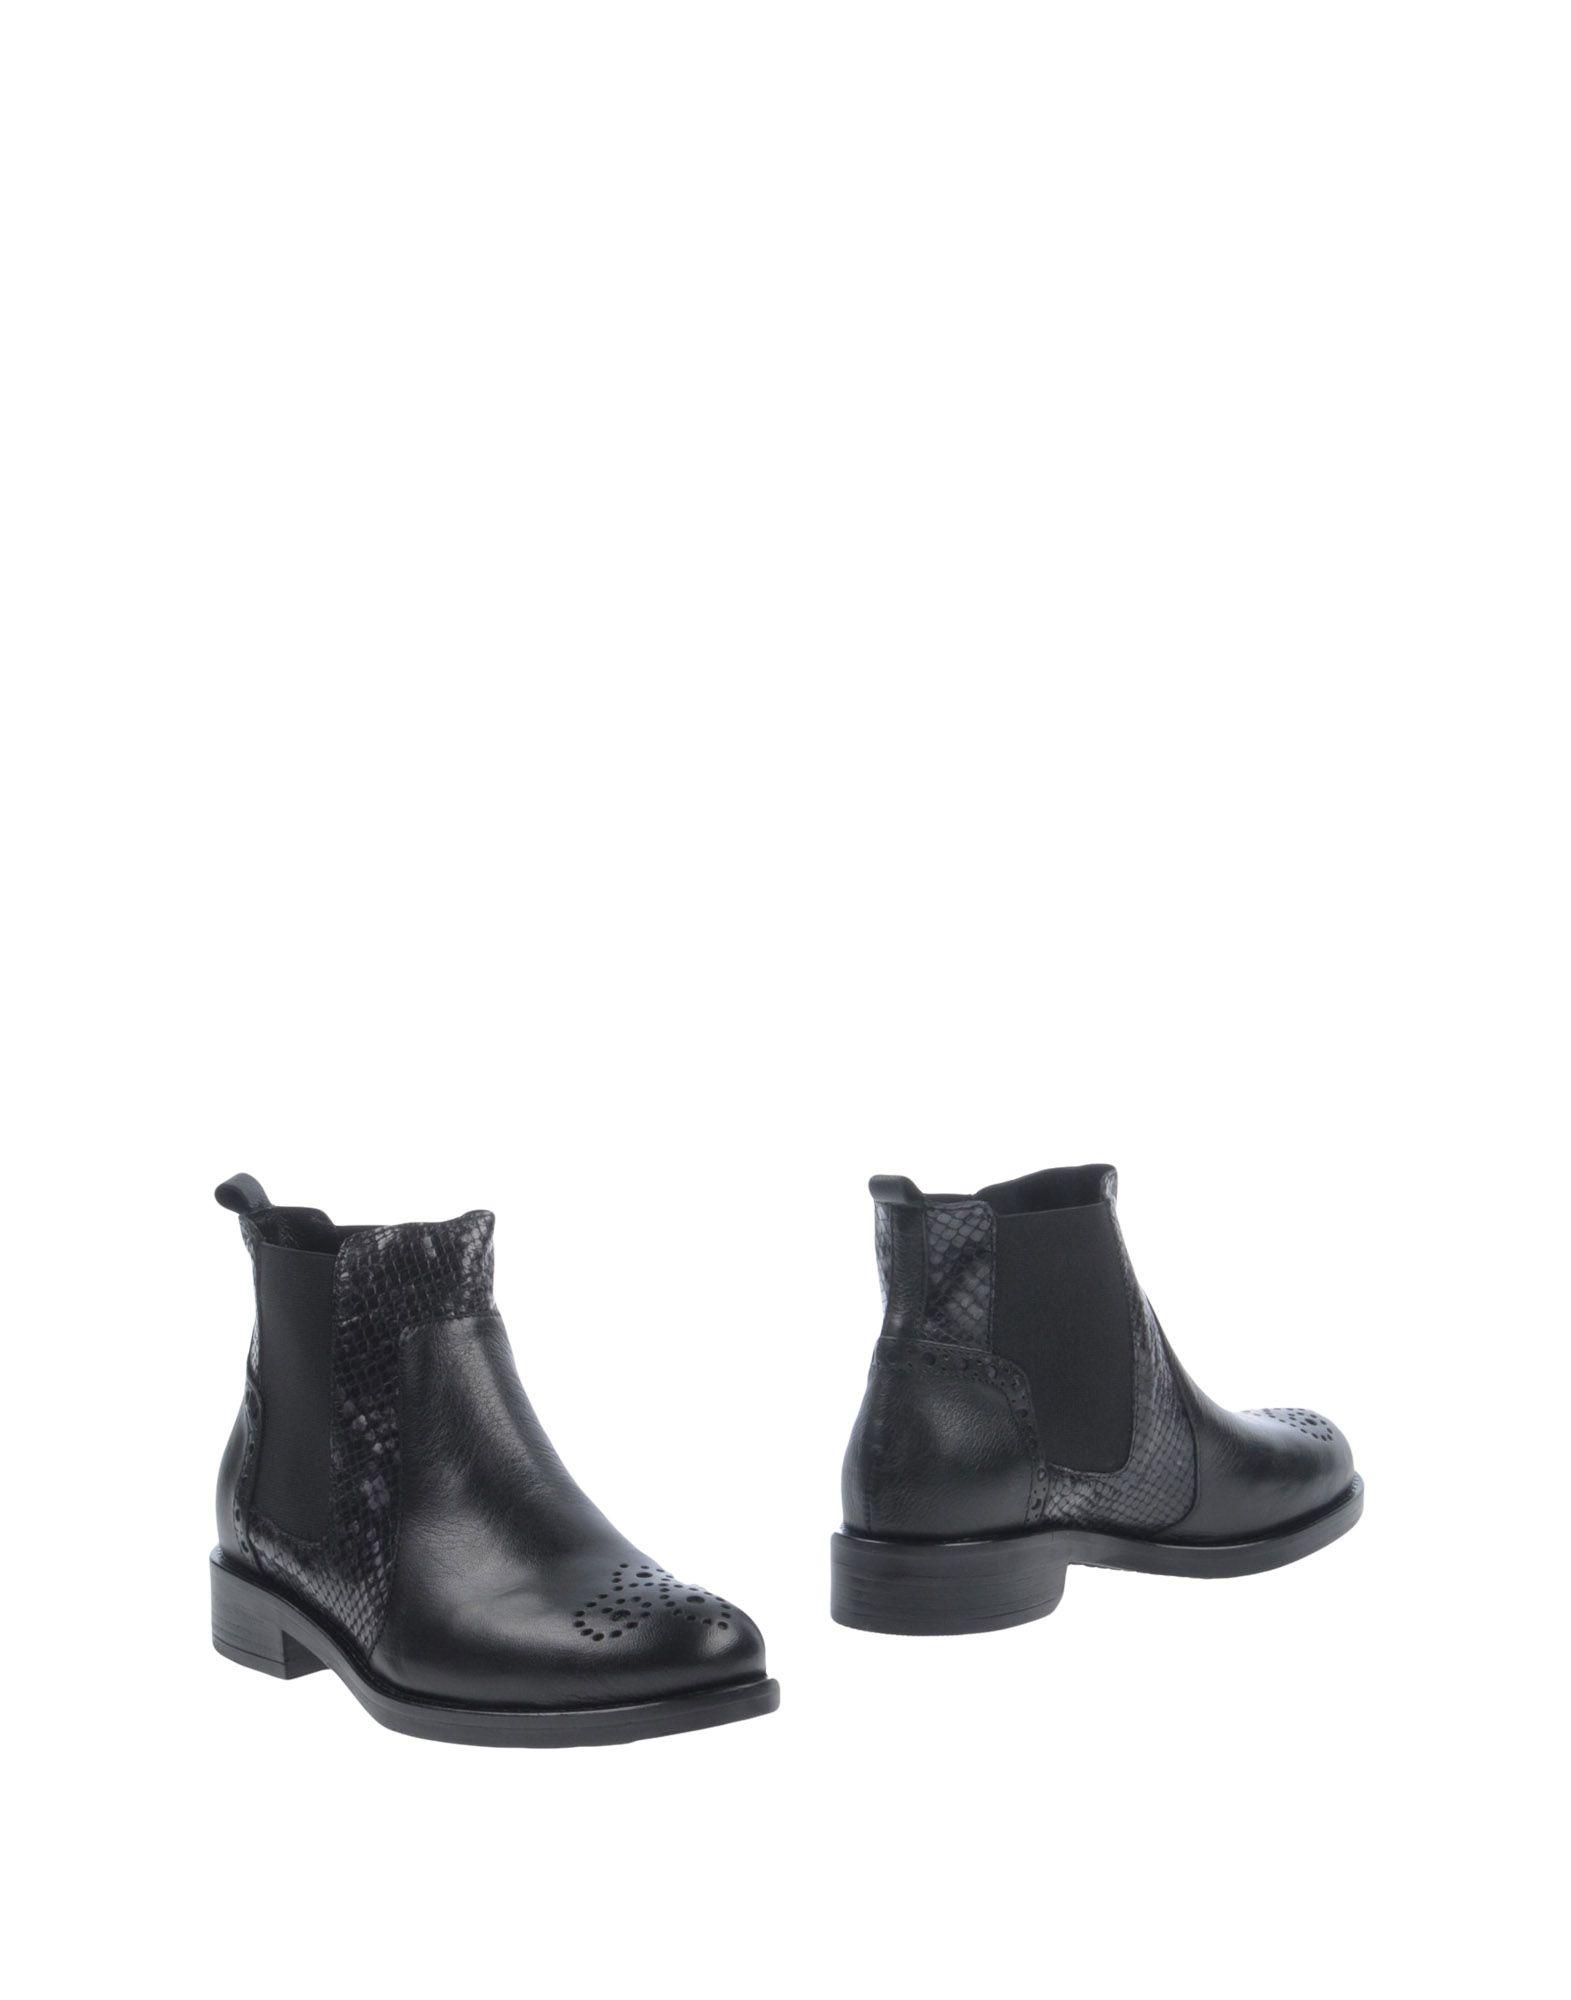 Emanuela Passeri Ankle Boot - Women online Emanuela Passeri Ankle Boots online Women on  Australia - 11444697NN f2f0f5